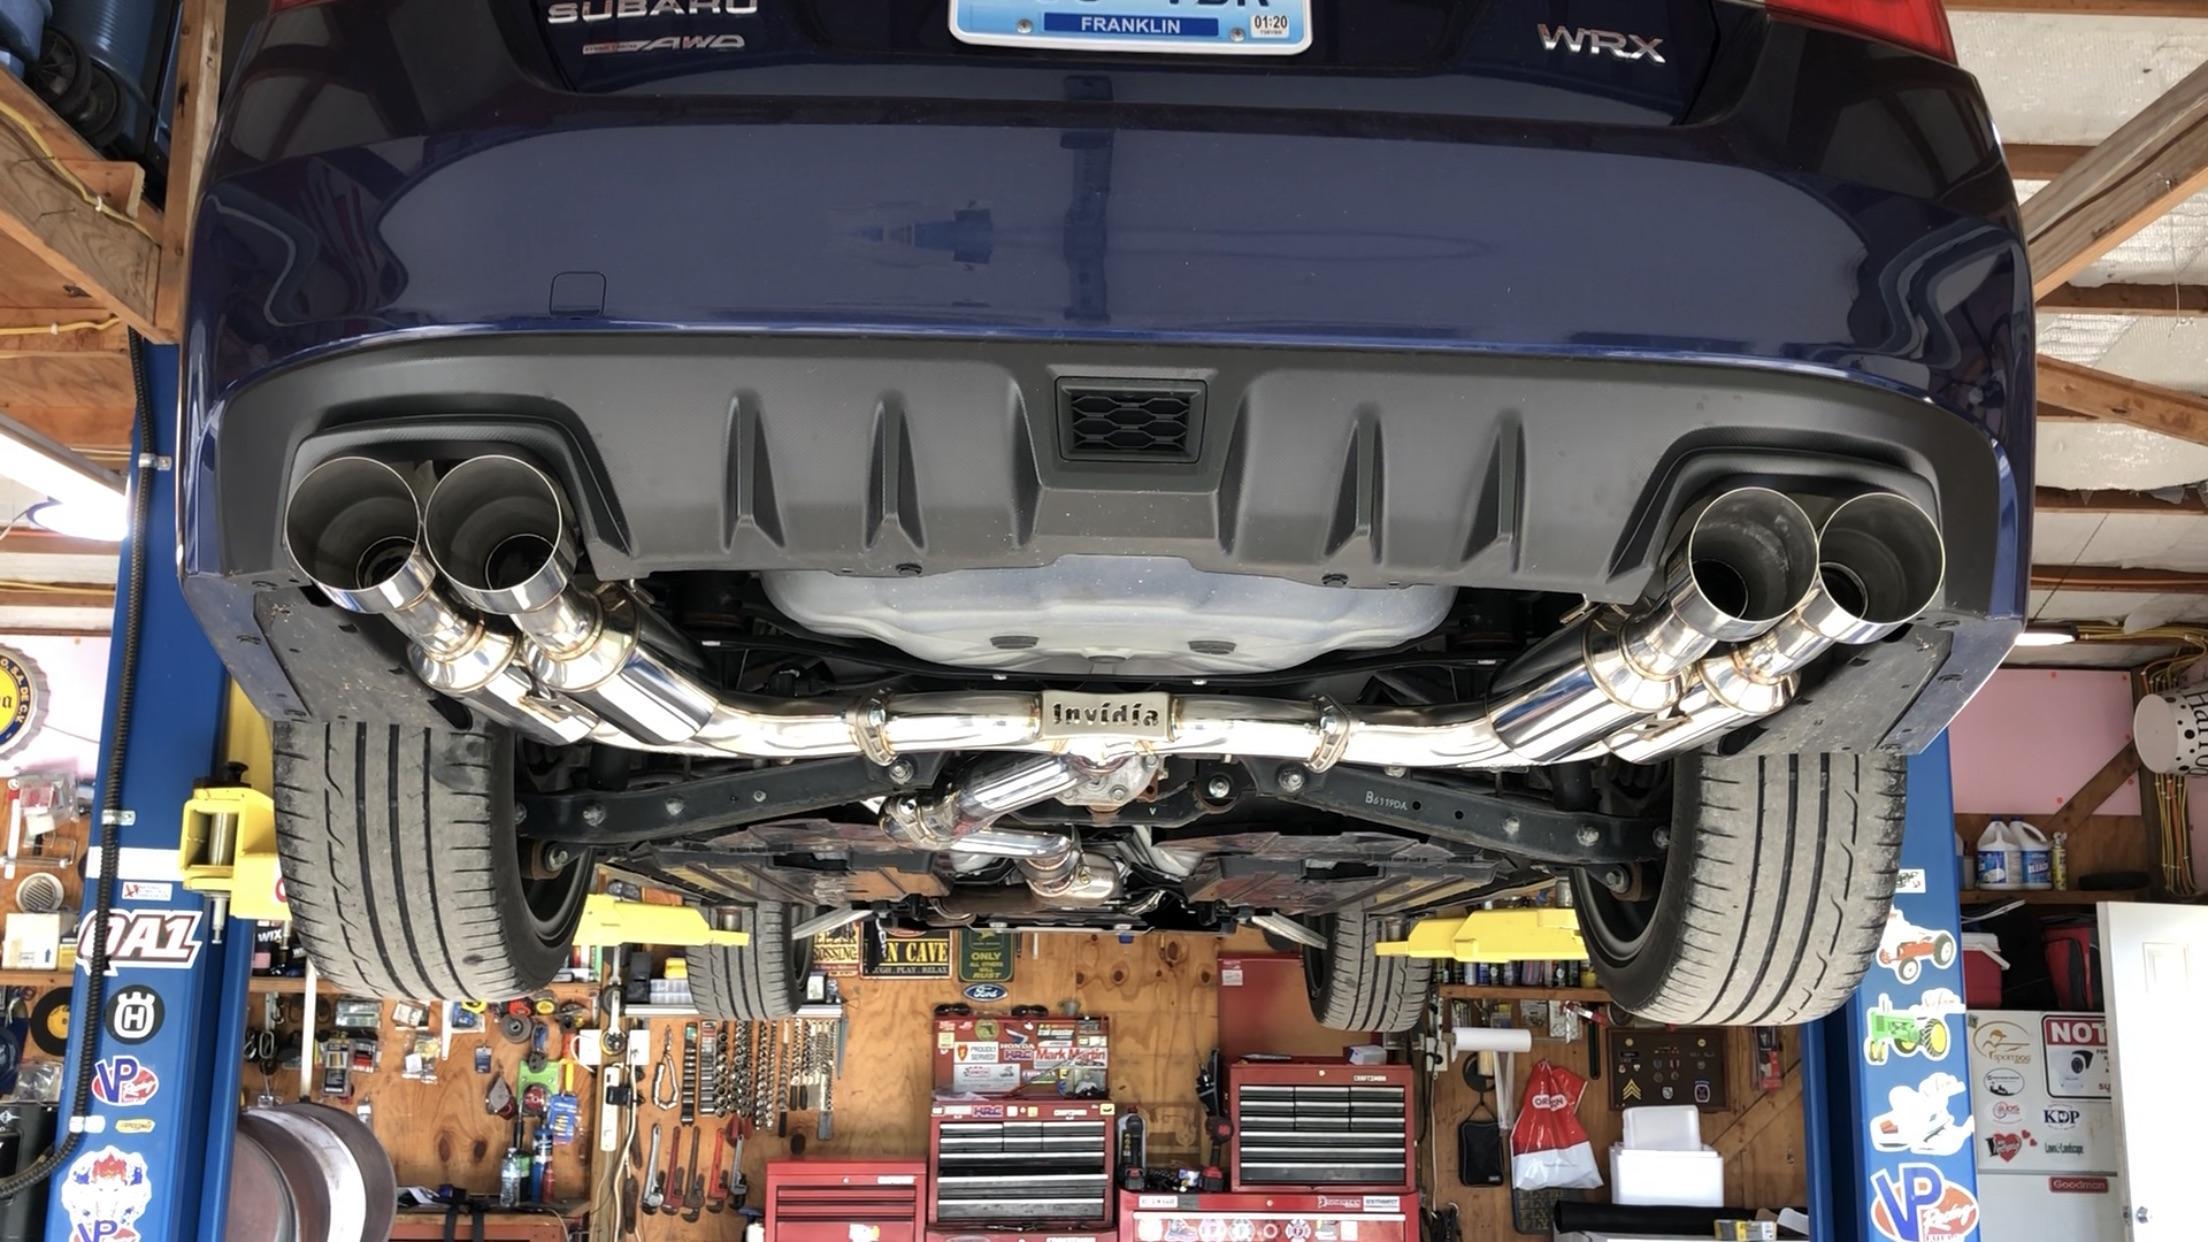 invidia r400 cat back exhaust installed